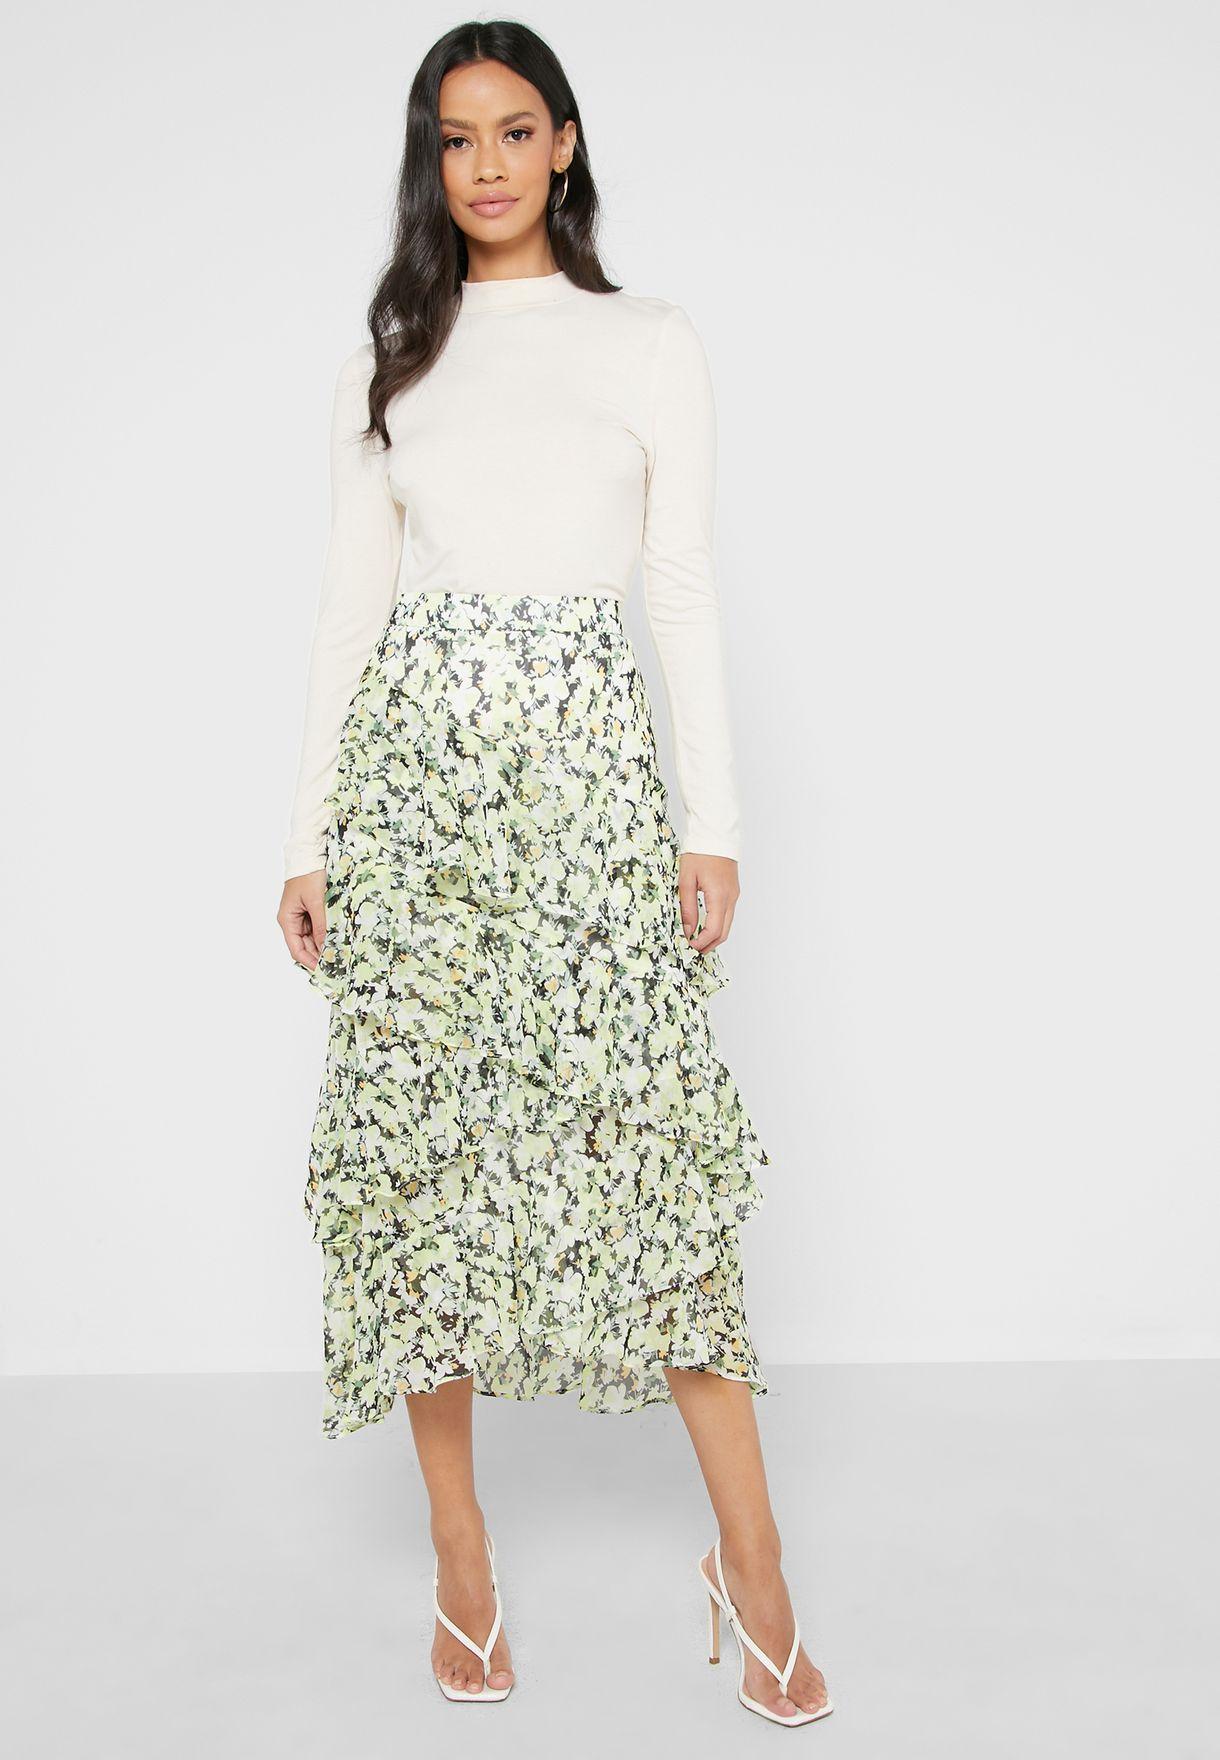 Zendeya Floral Midaxi Skirt